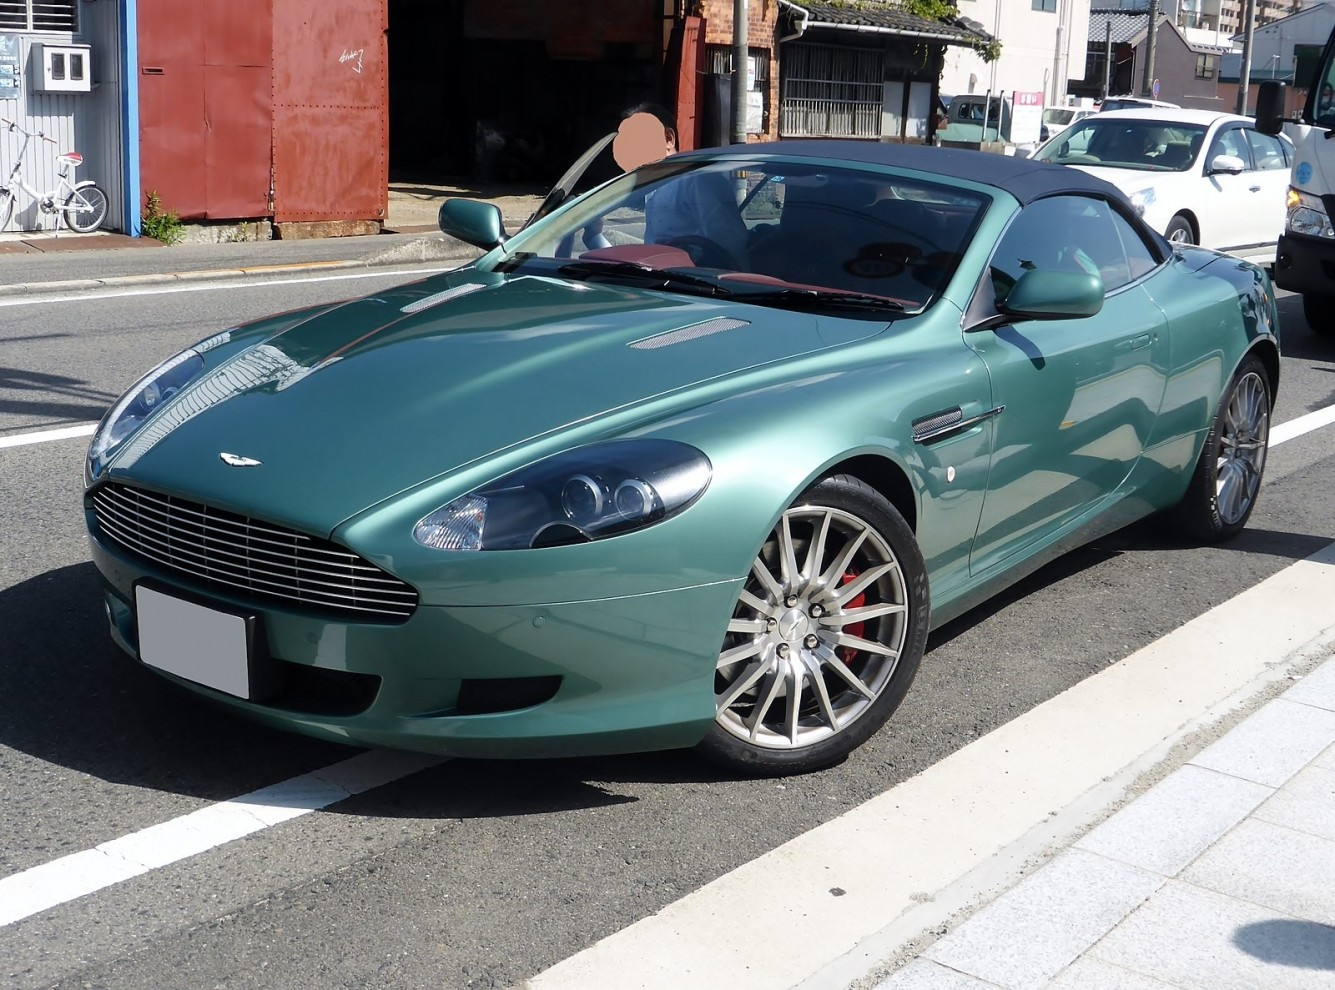 Aston Martin DB9 Volante - Top Hydraulics, Inc.